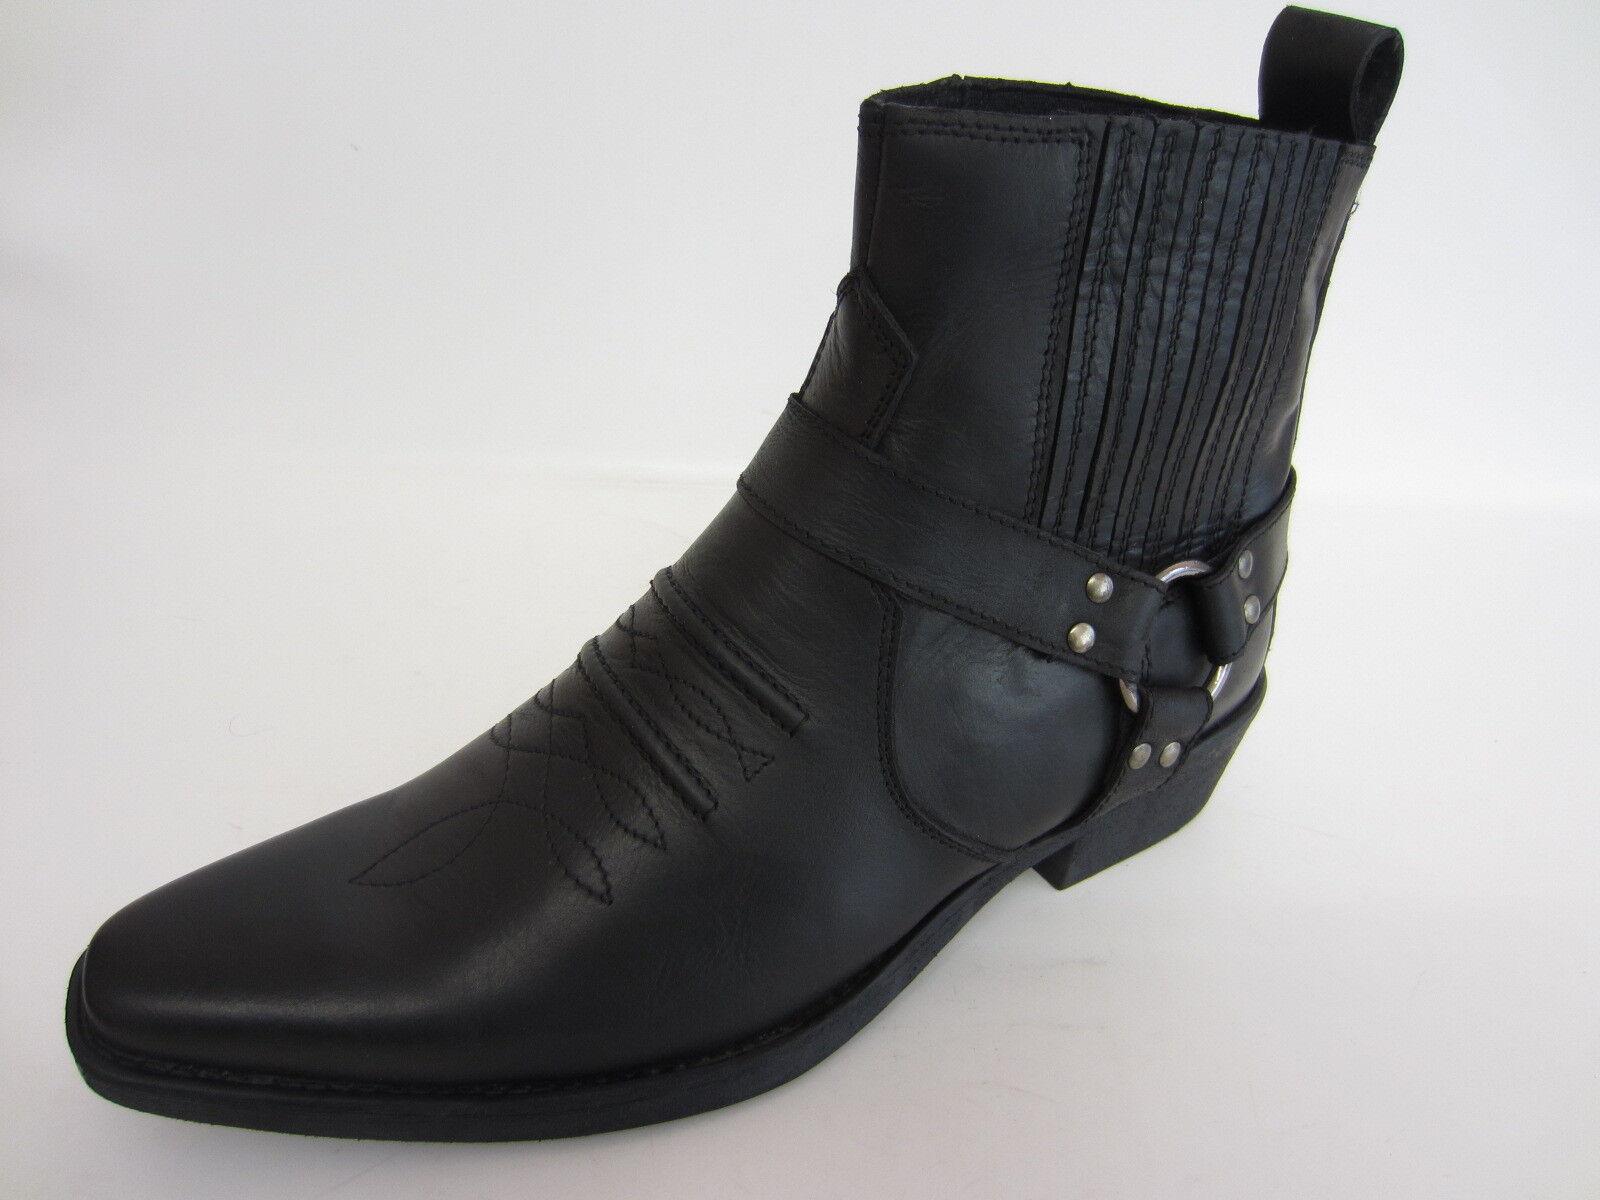 Maverick A3R003 para hombre Negro Cuero tire de botas (R25A medio)